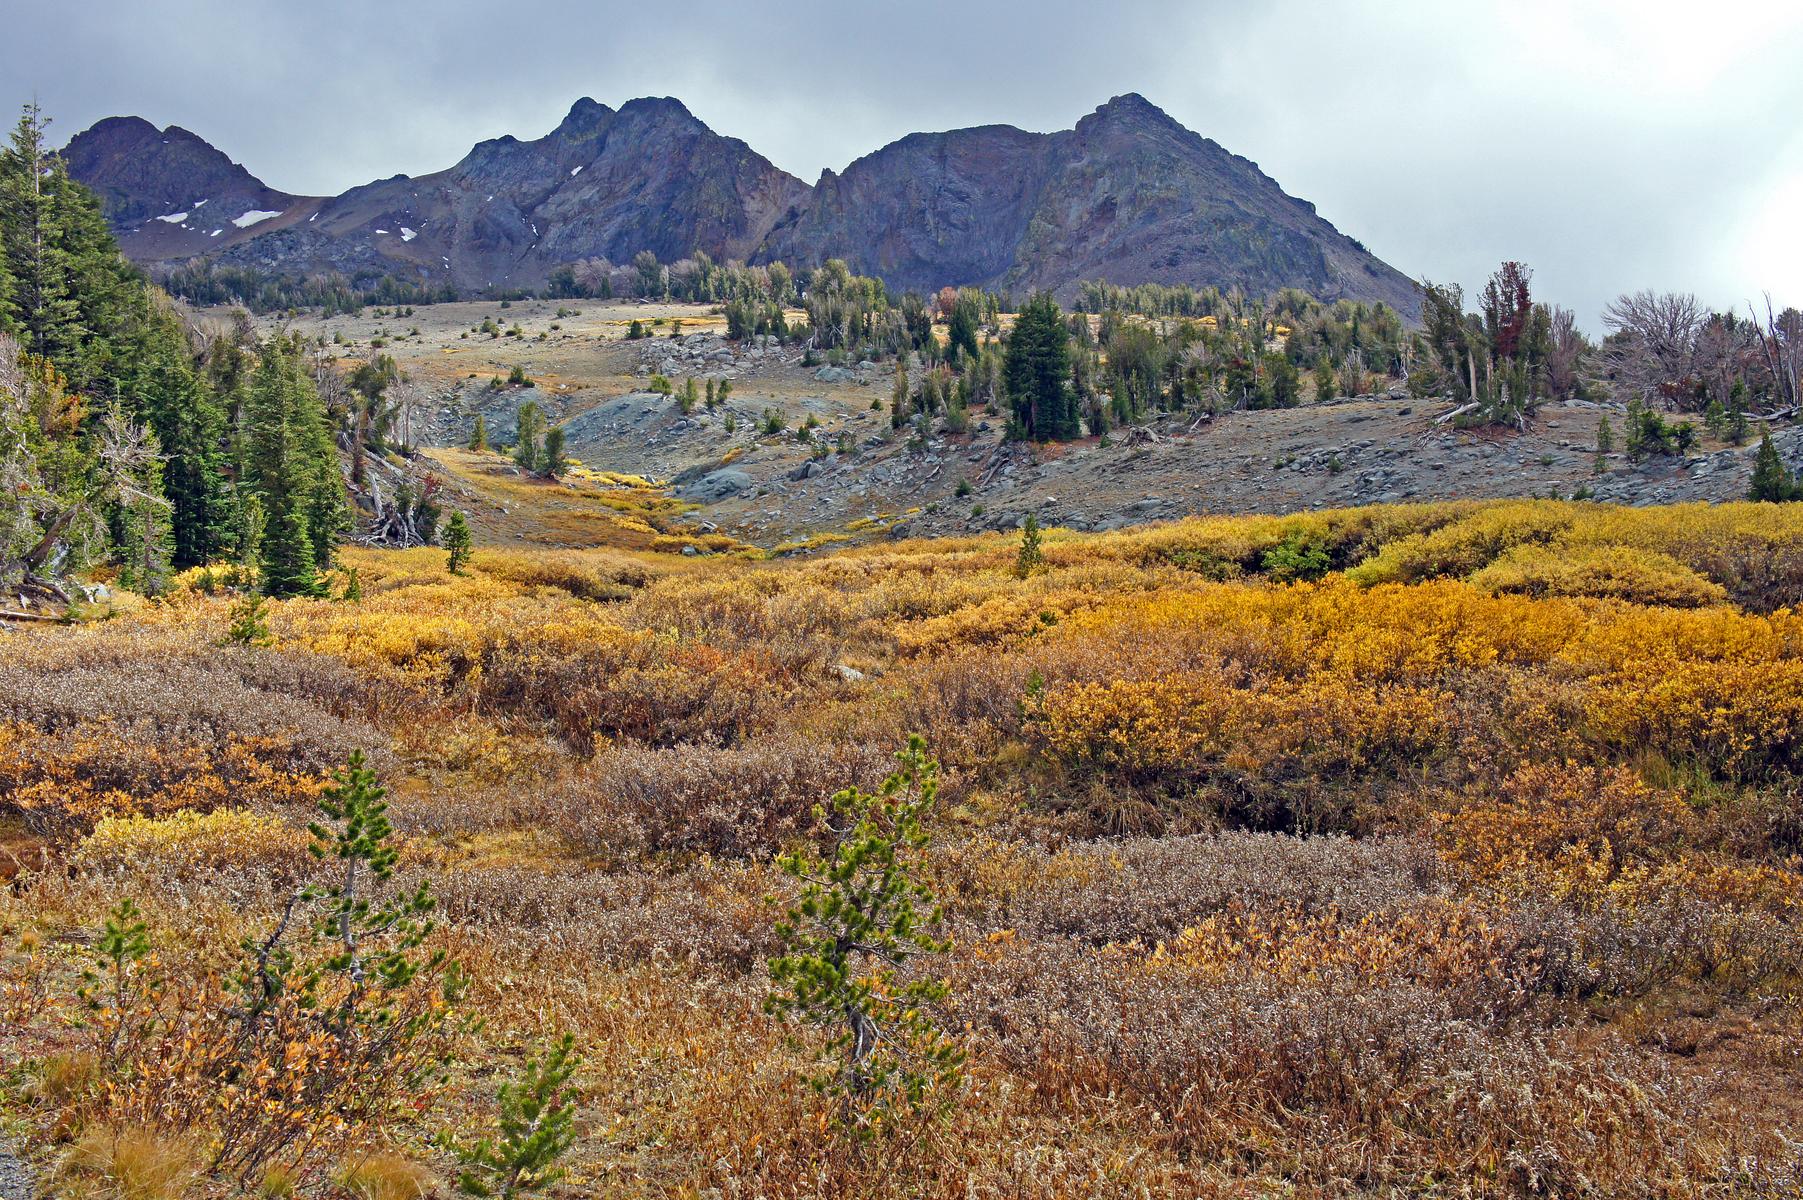 near Carson Pass in the Mokelumne Wilderness, California